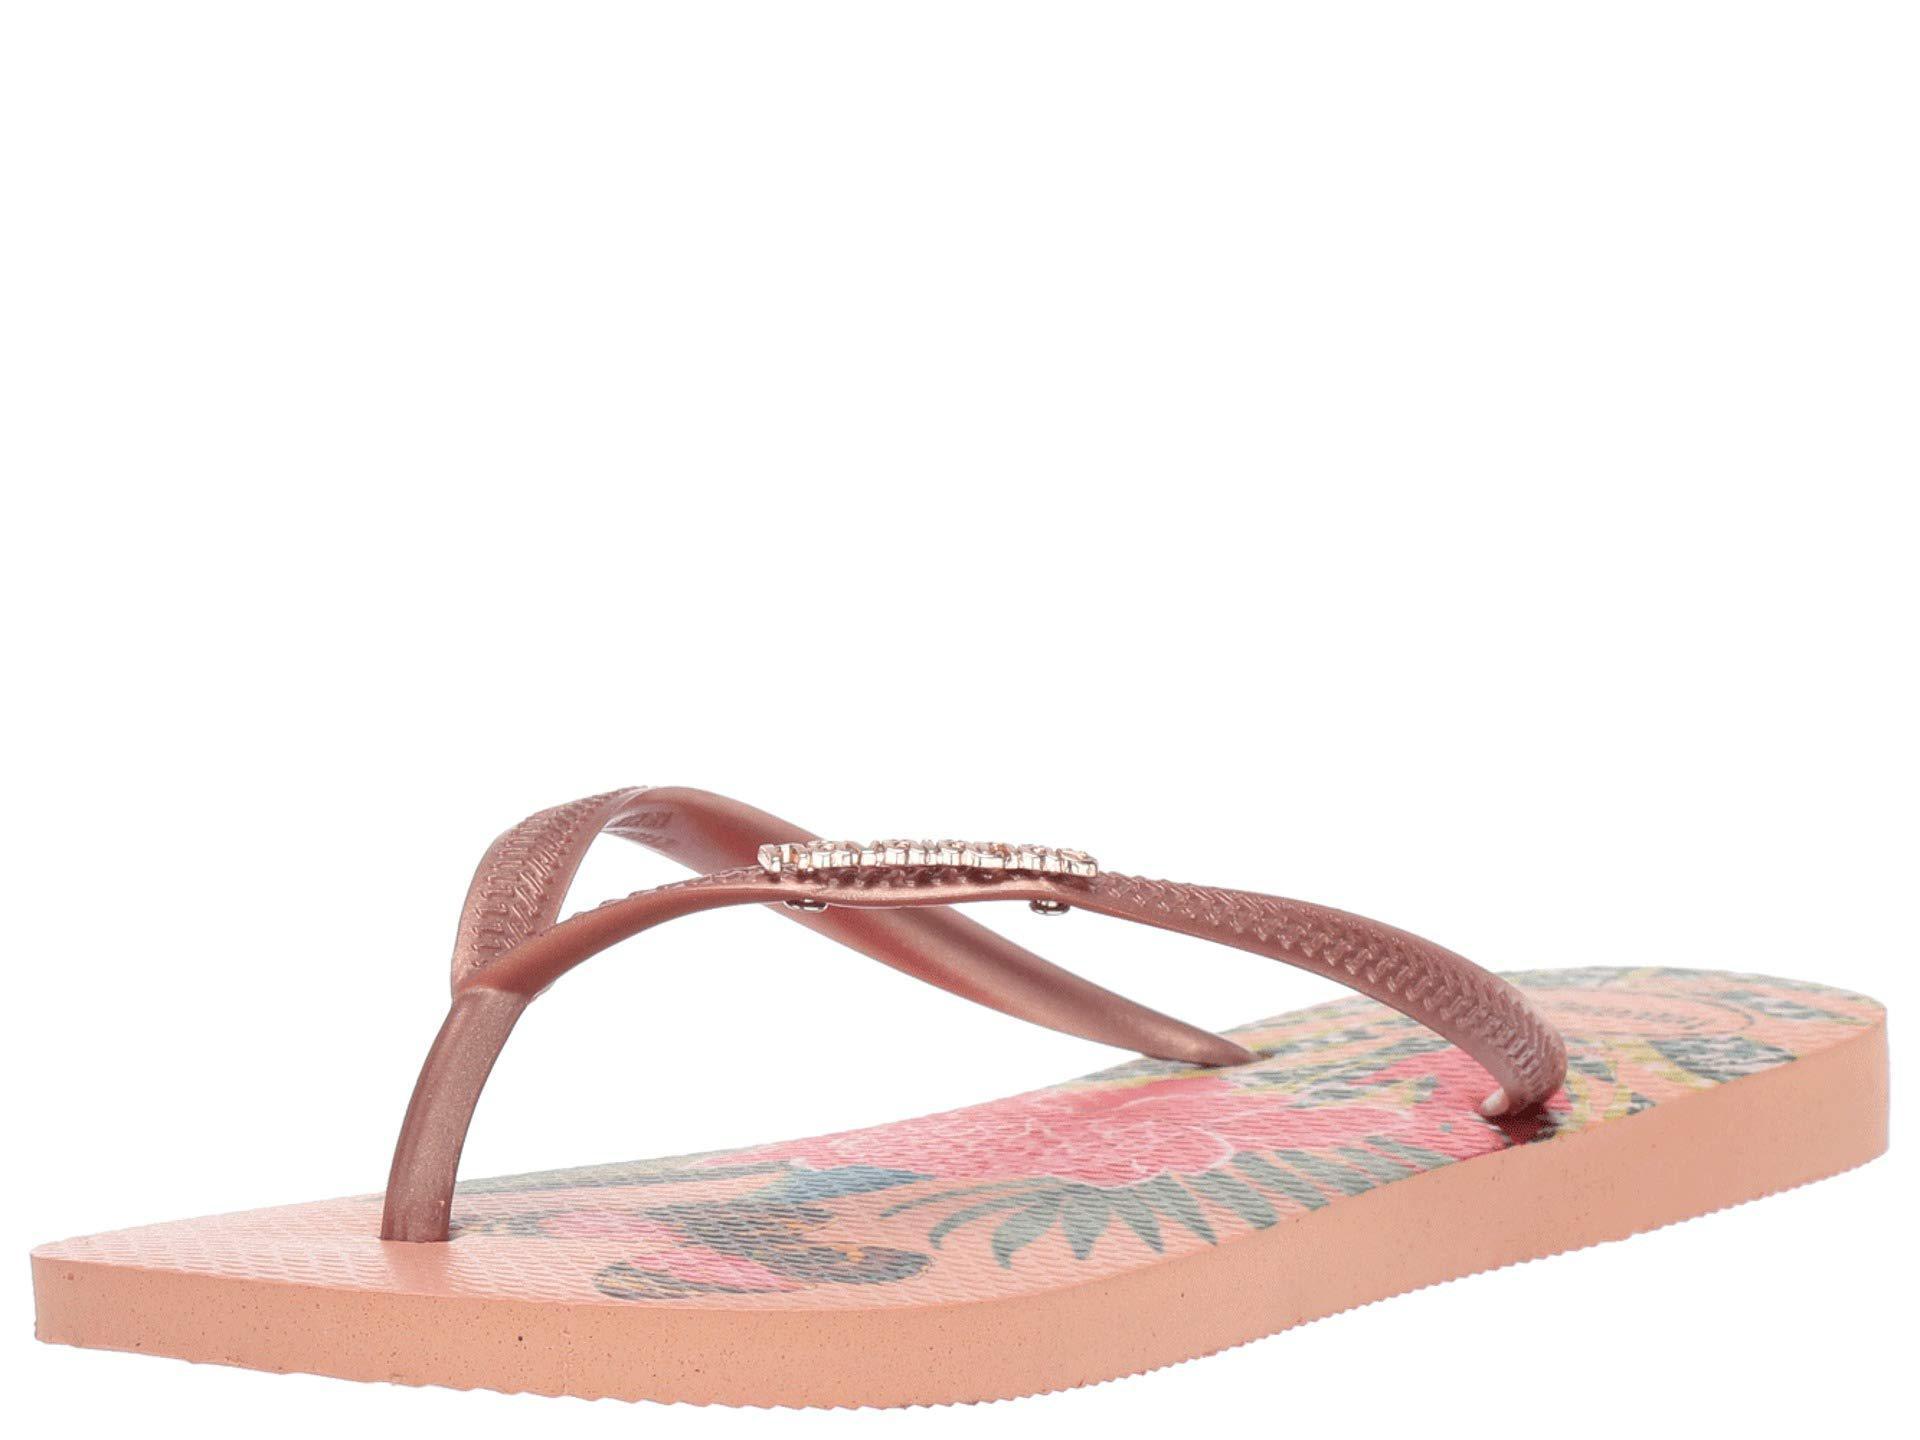 915a083cd285 Havaianas - Pink Slim Tropical Flip Flops (black graphite) Women s Sandals  - Lyst. View fullscreen